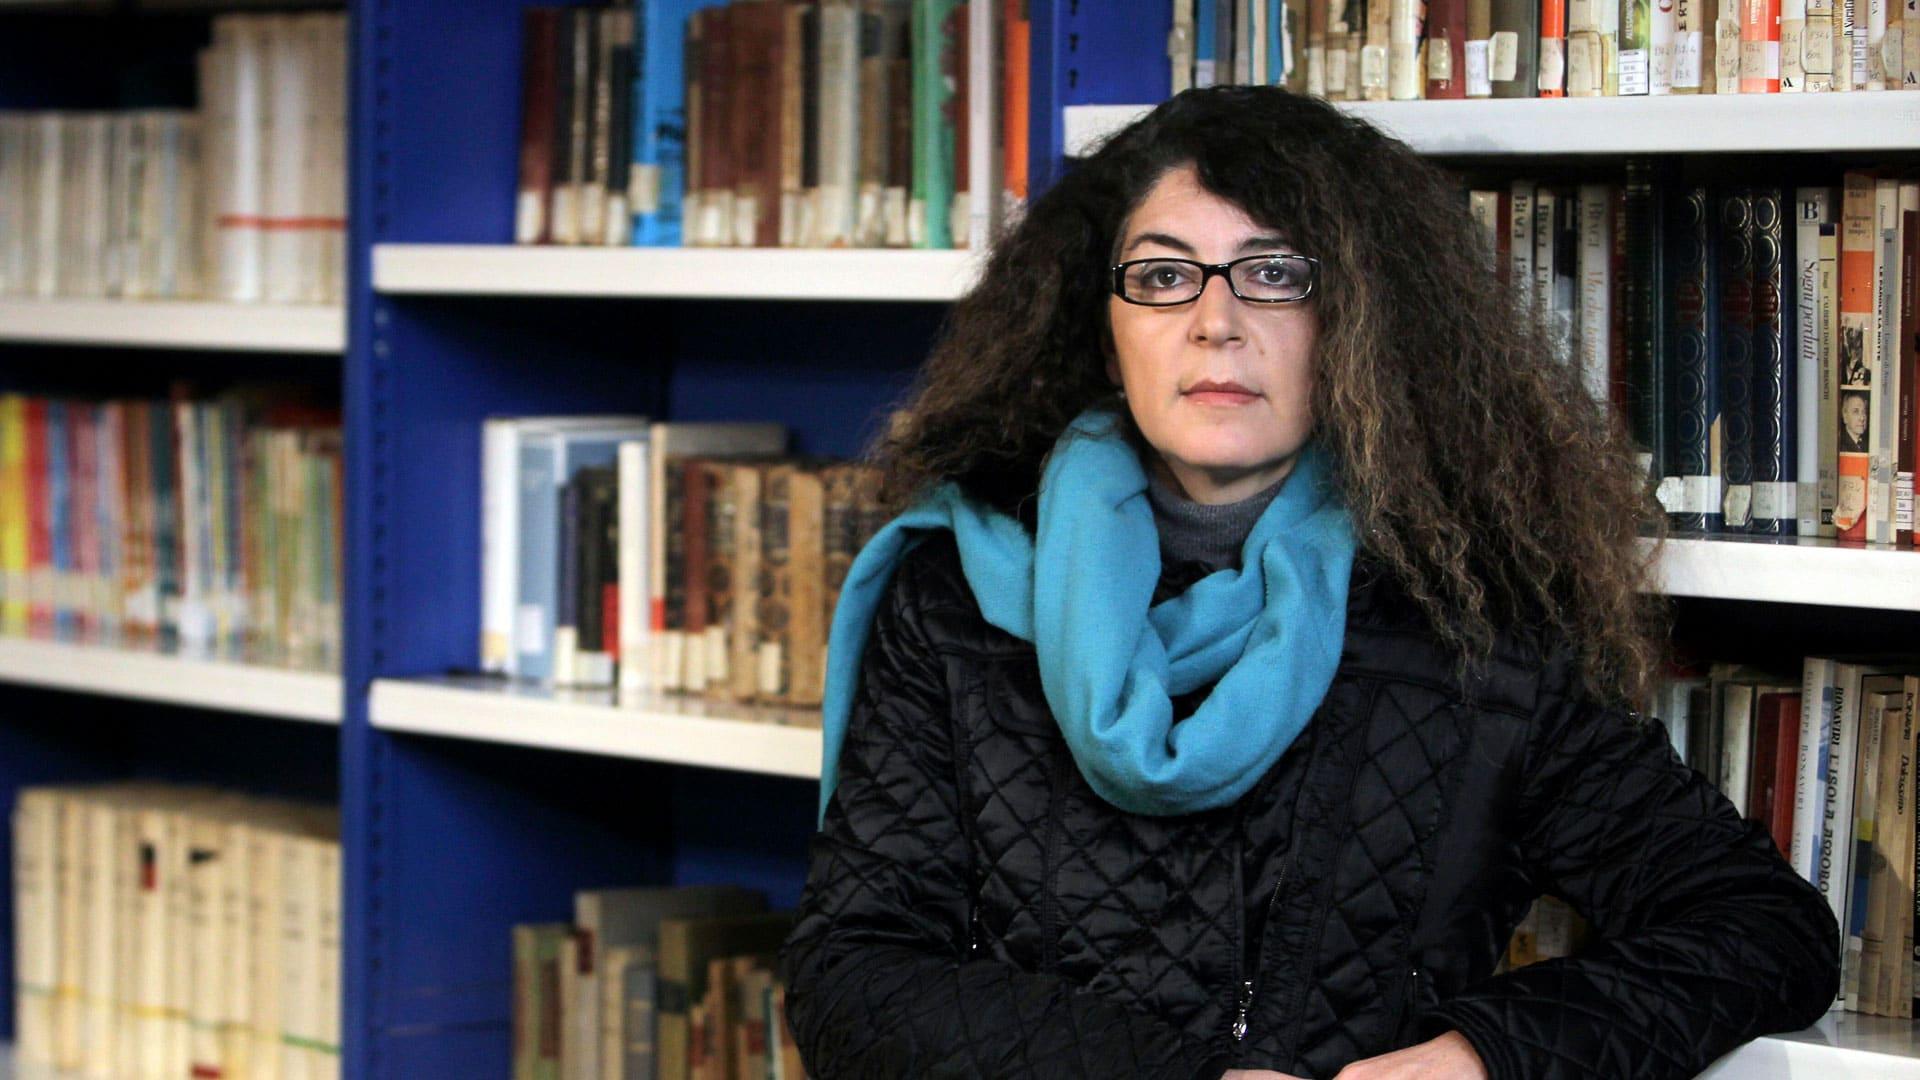 La Compagnia du Servu ospita le scrittrici Melania Mazzucco, Daria Colombo e Dacia Maraini. Coordina Francesca Rotta Gentile